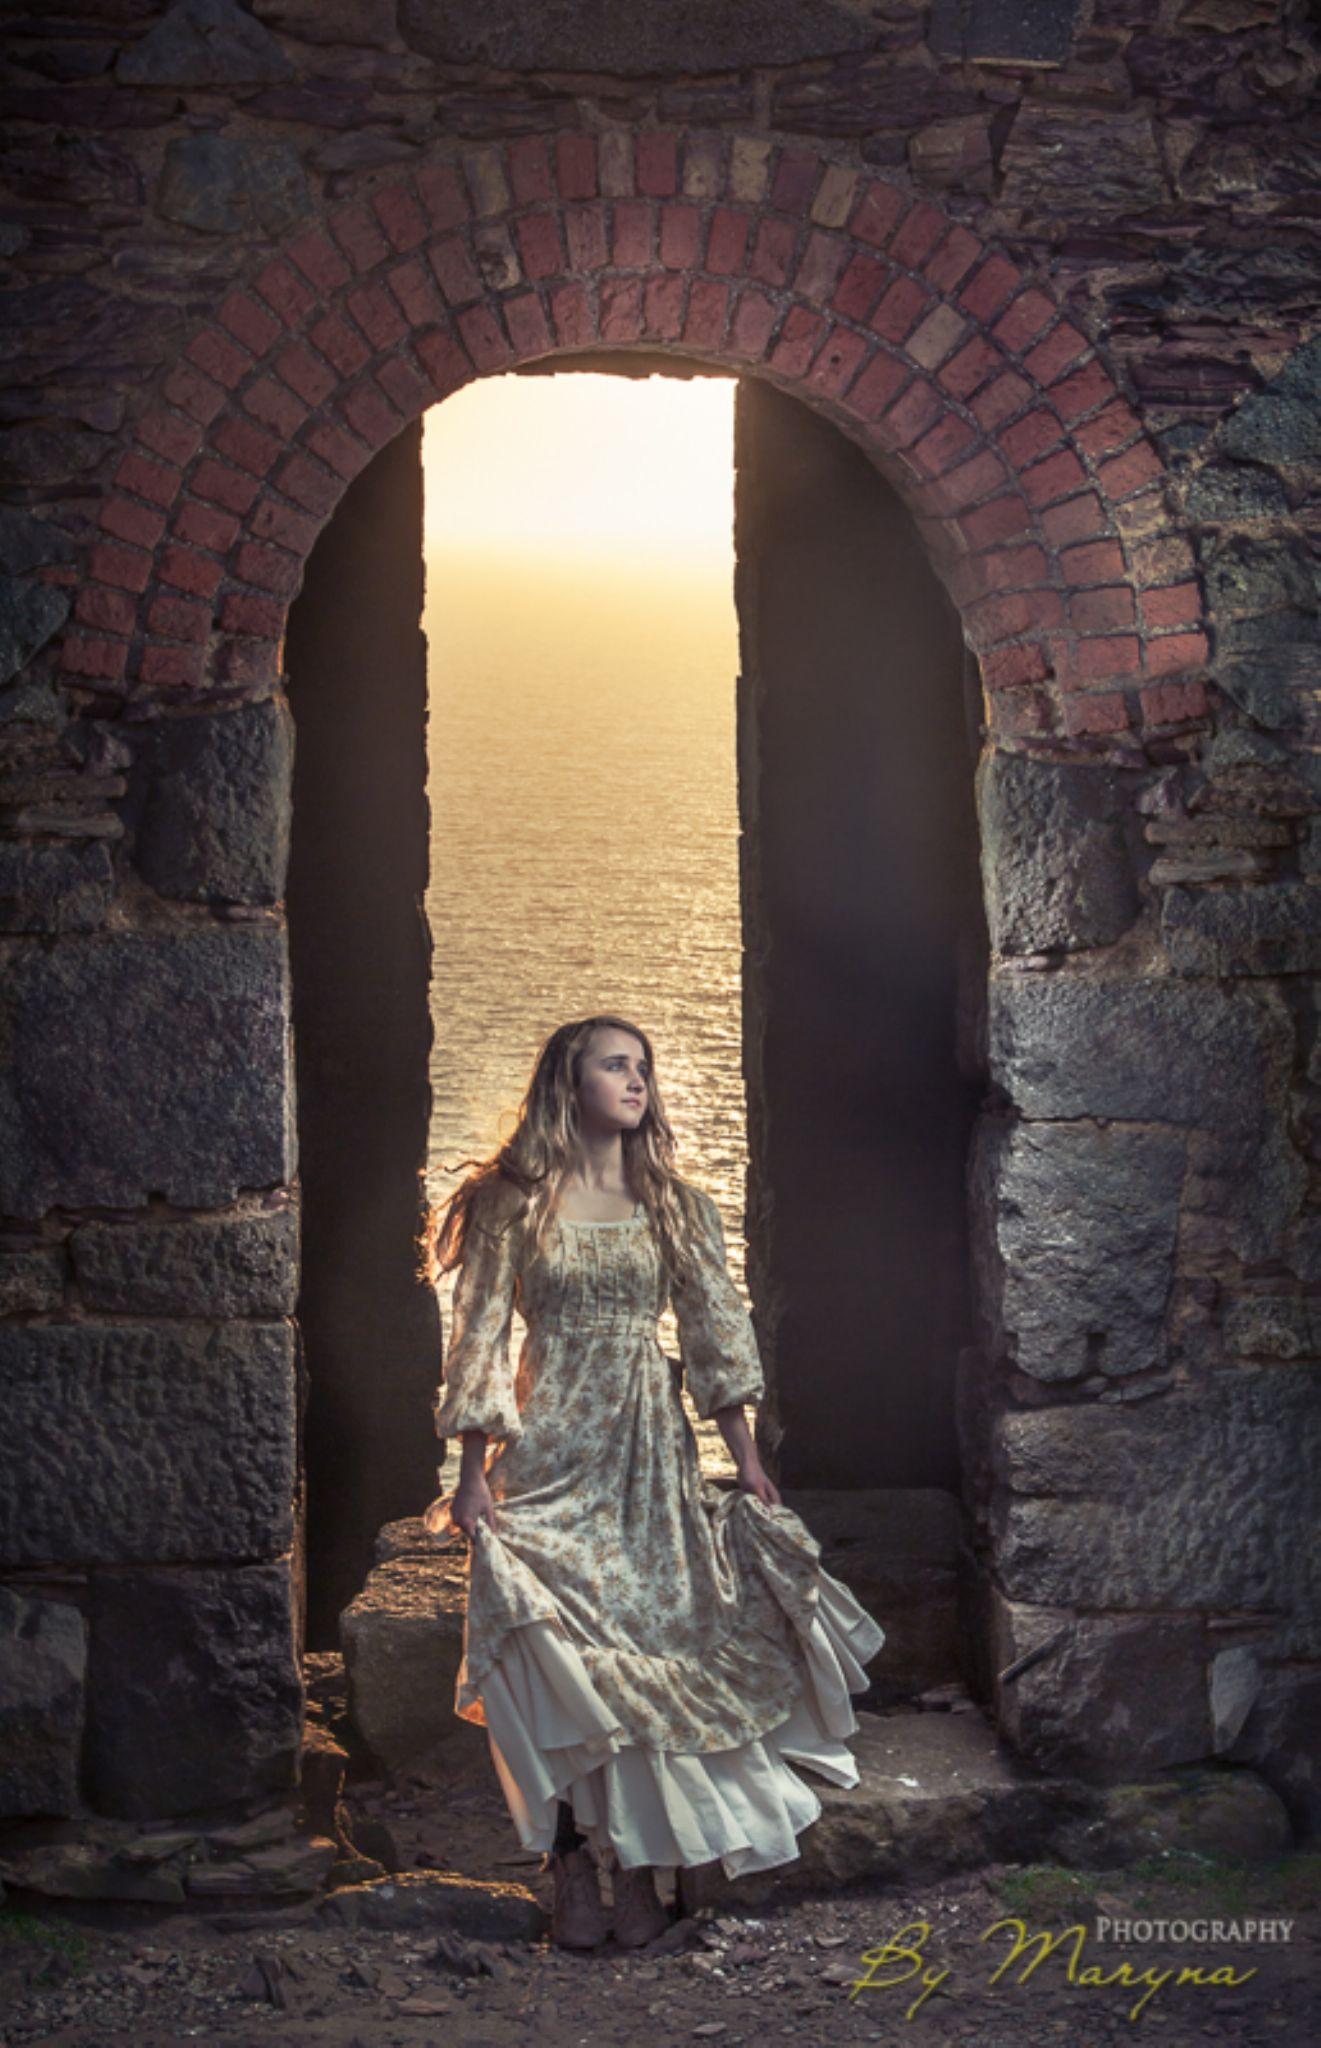 Tales from long ago. Cornwall by Maryna Halton